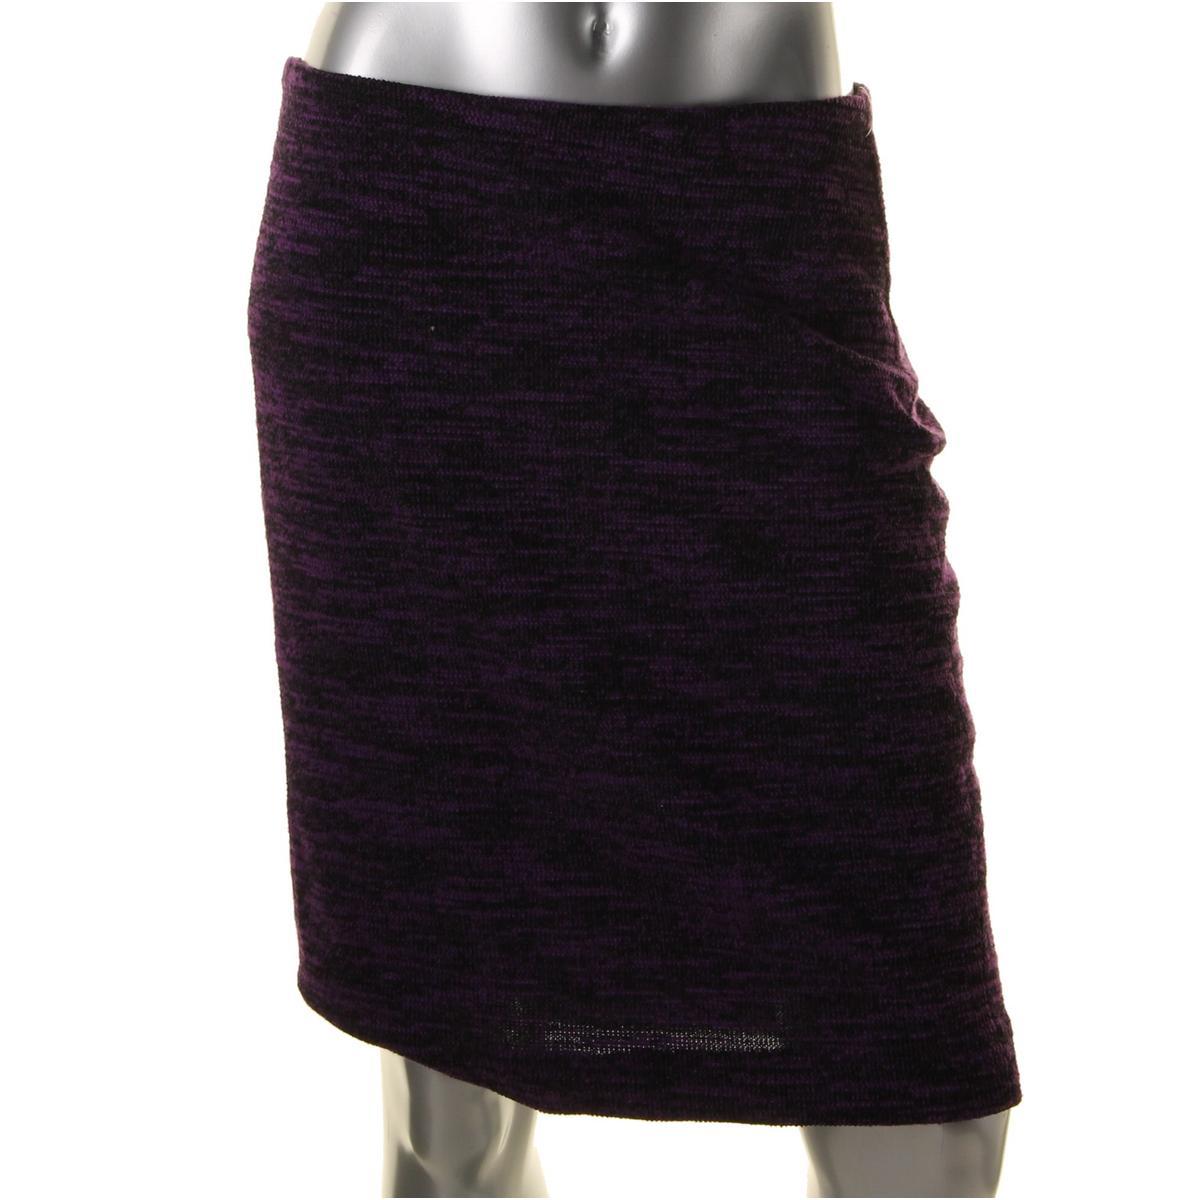 grace elements 0912 womens marled tweed elastic waist